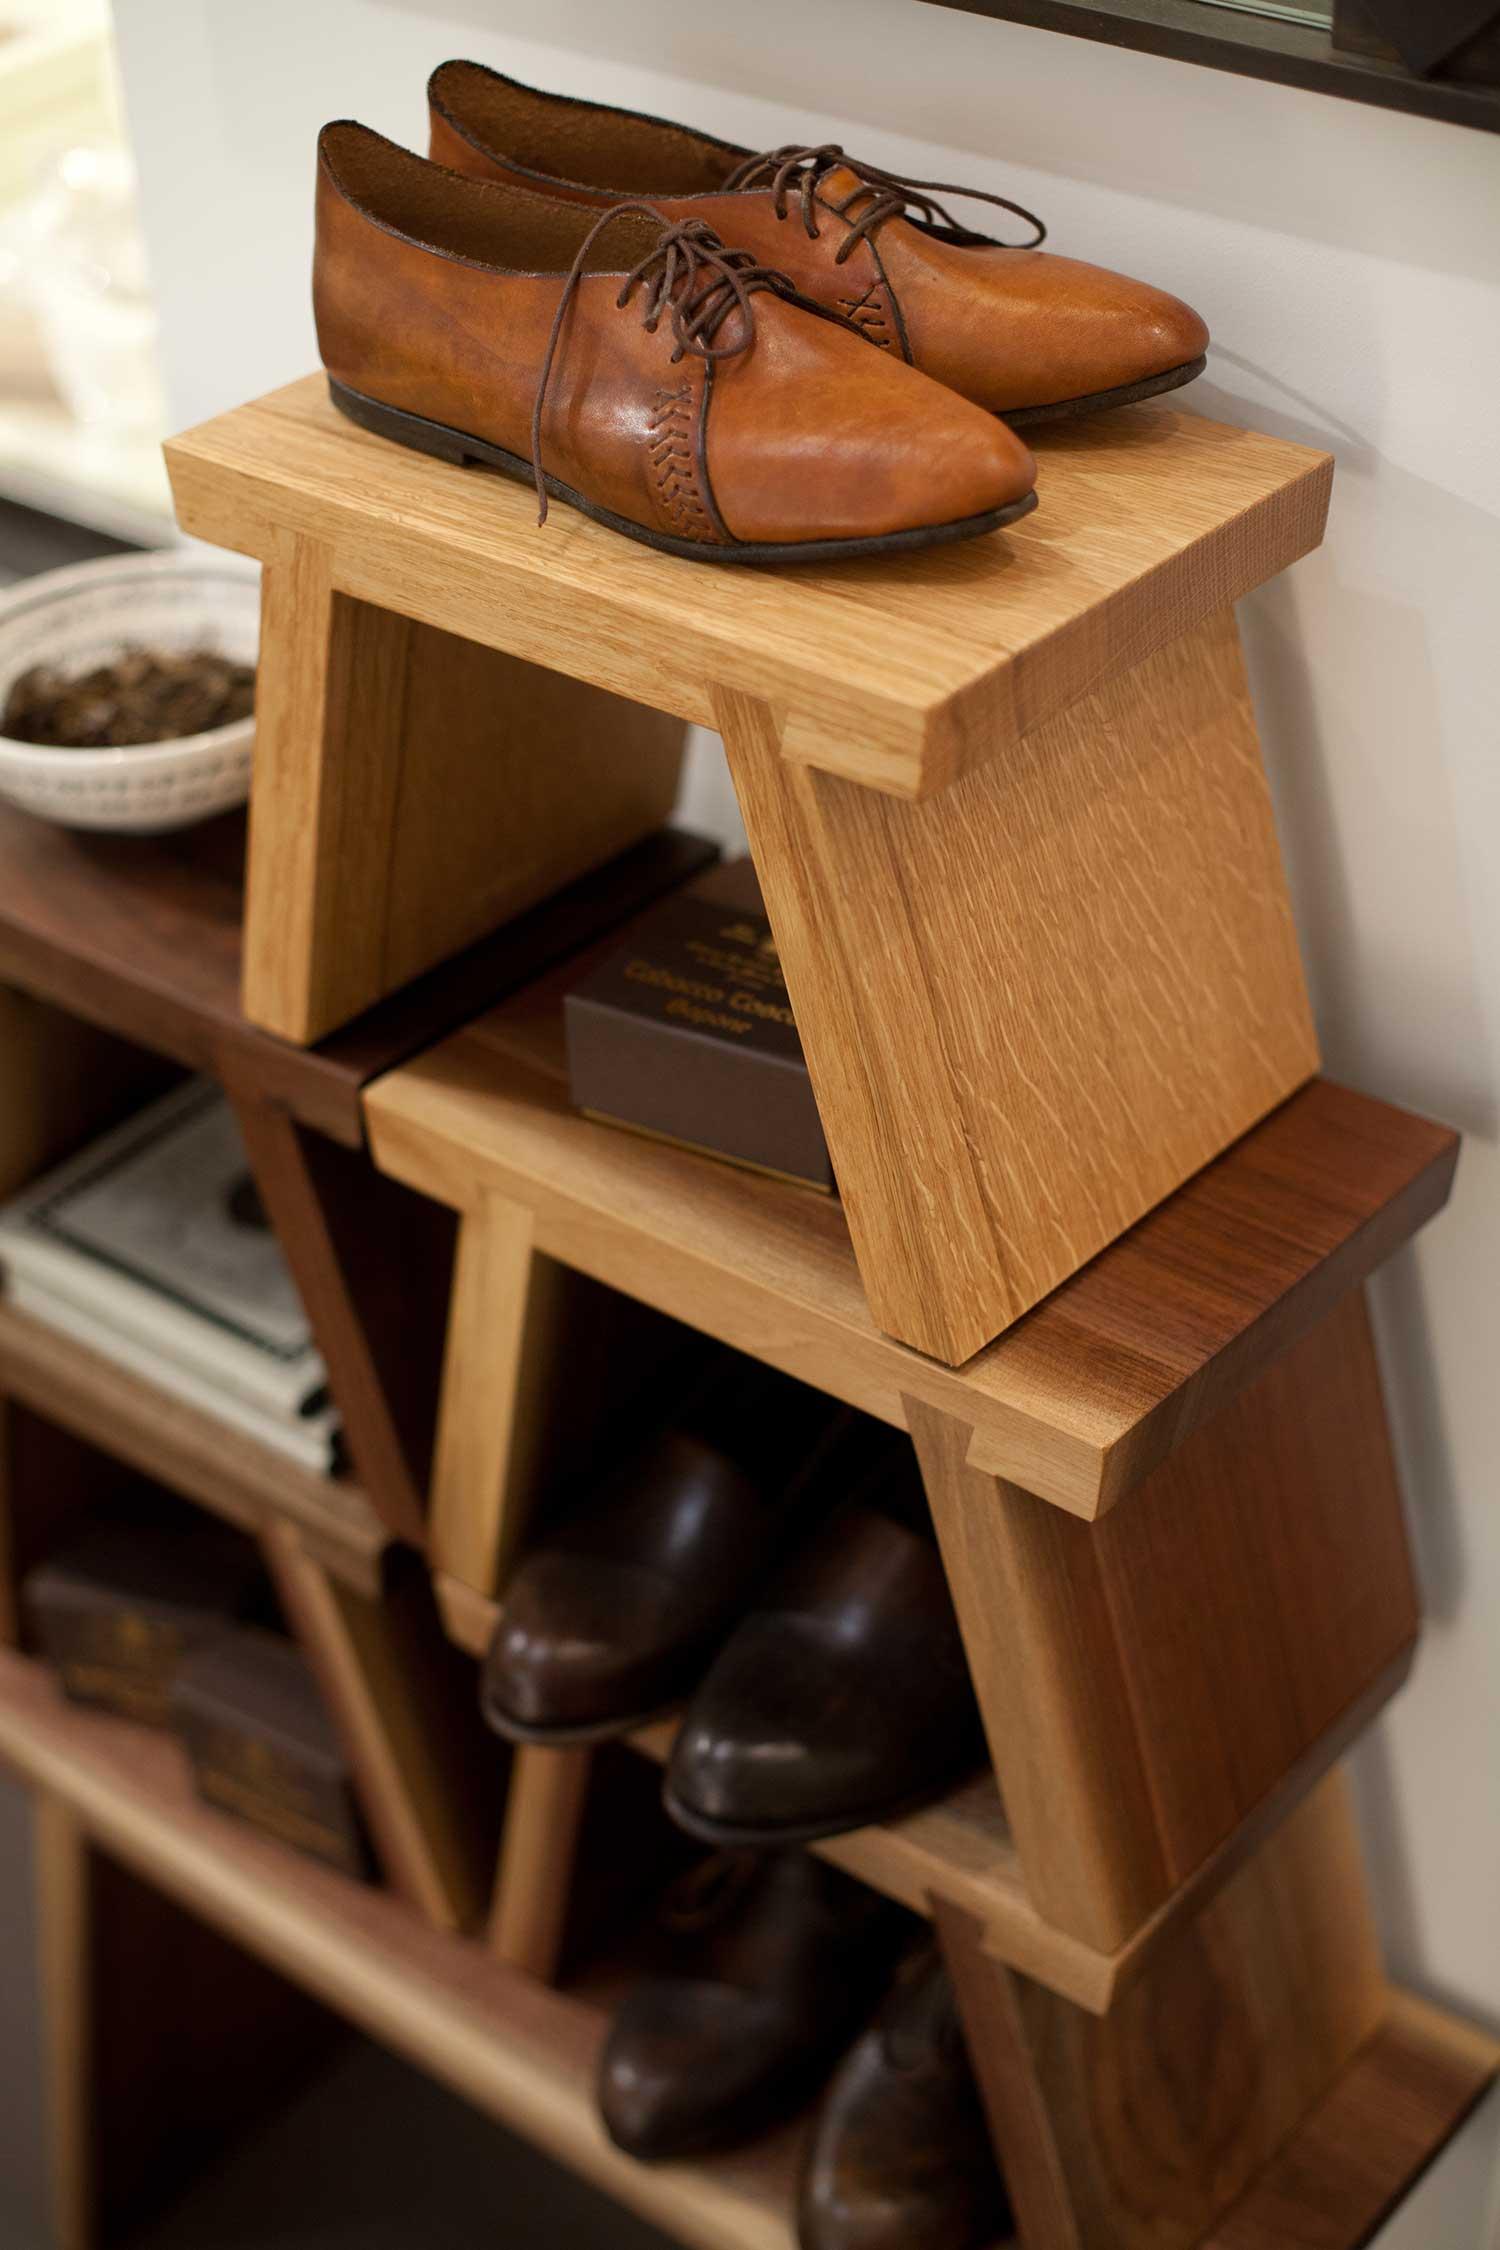 wickham_ZONA_little_stools_shoes_meredith_heuer_photography.jpg